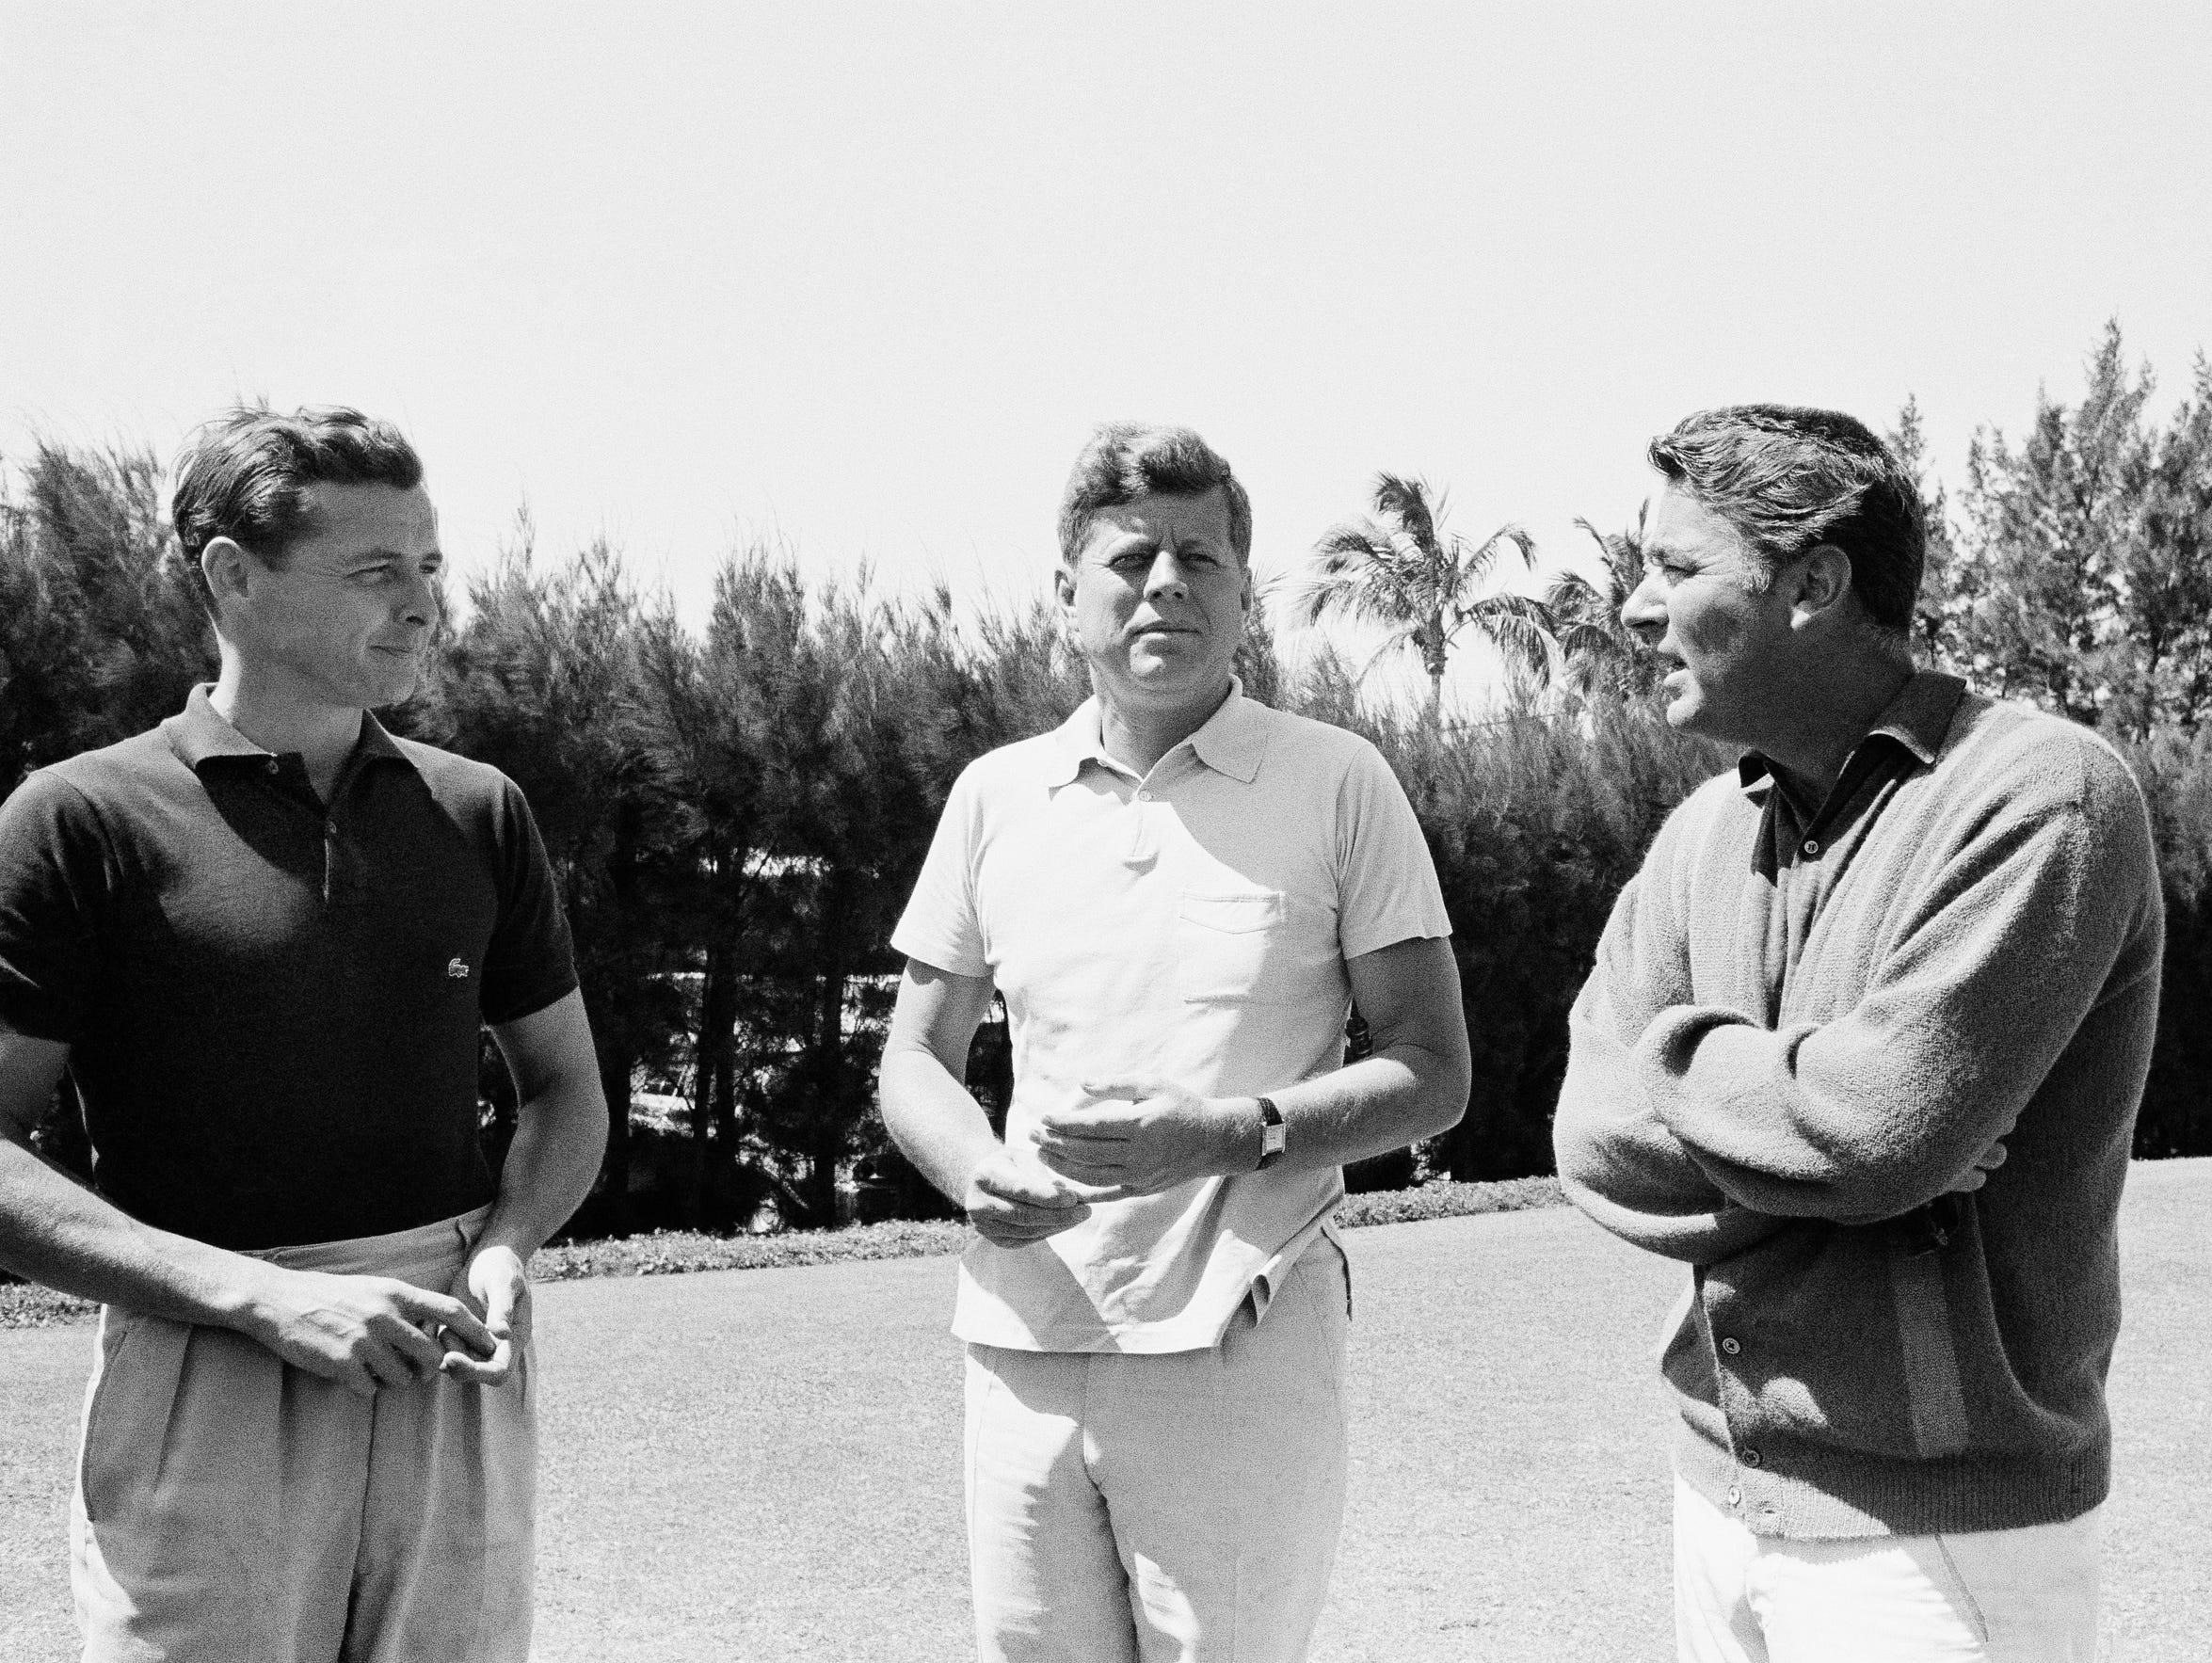 President John Kennedy, clad in a sport shirt and slacks,